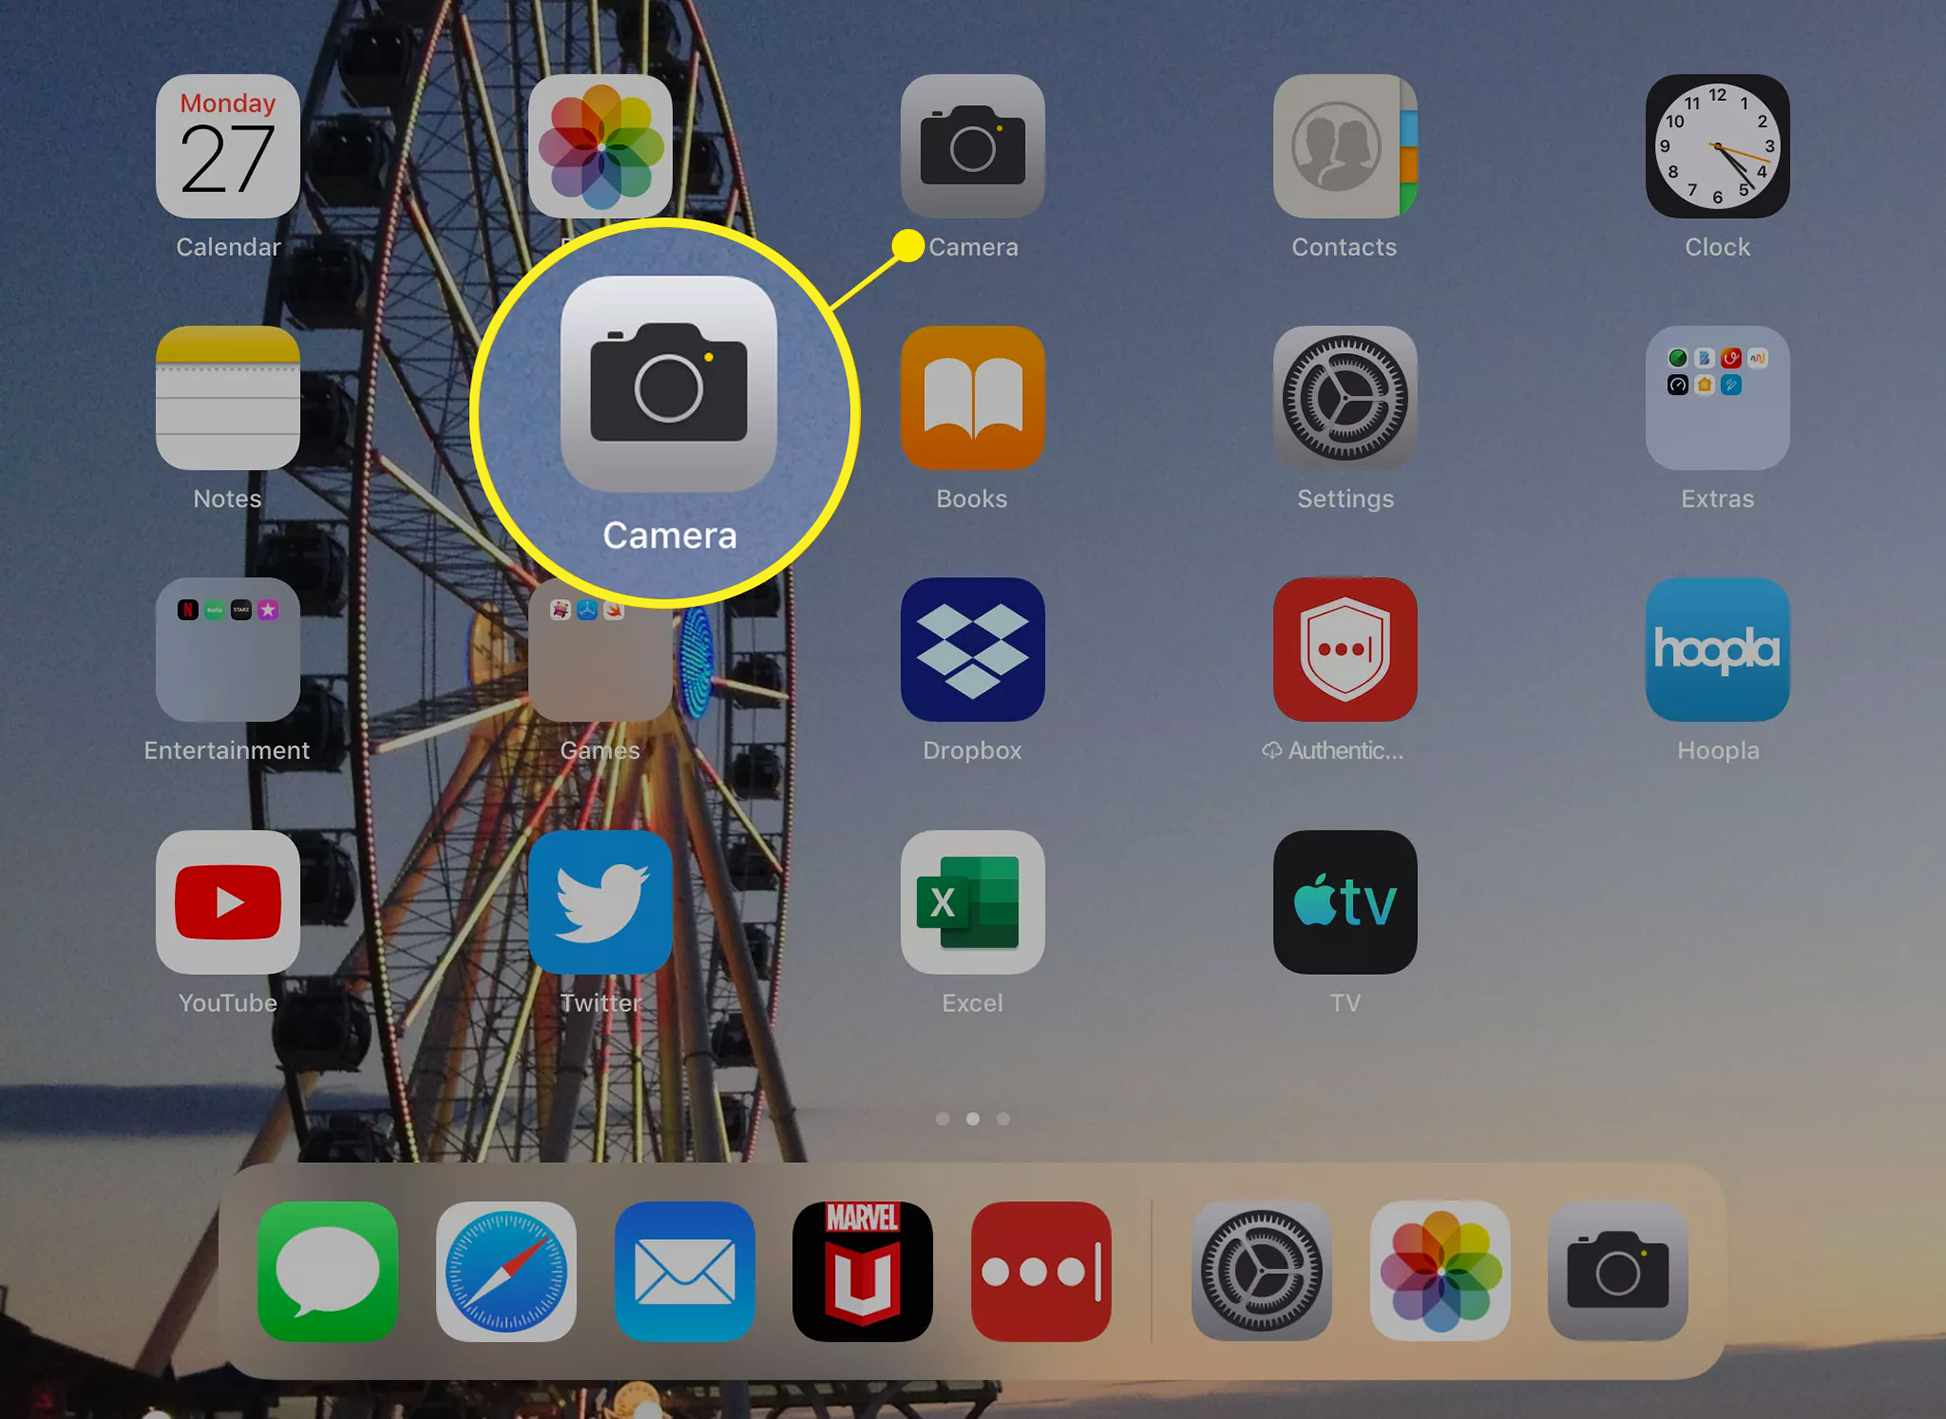 Camera app on iPad home screen